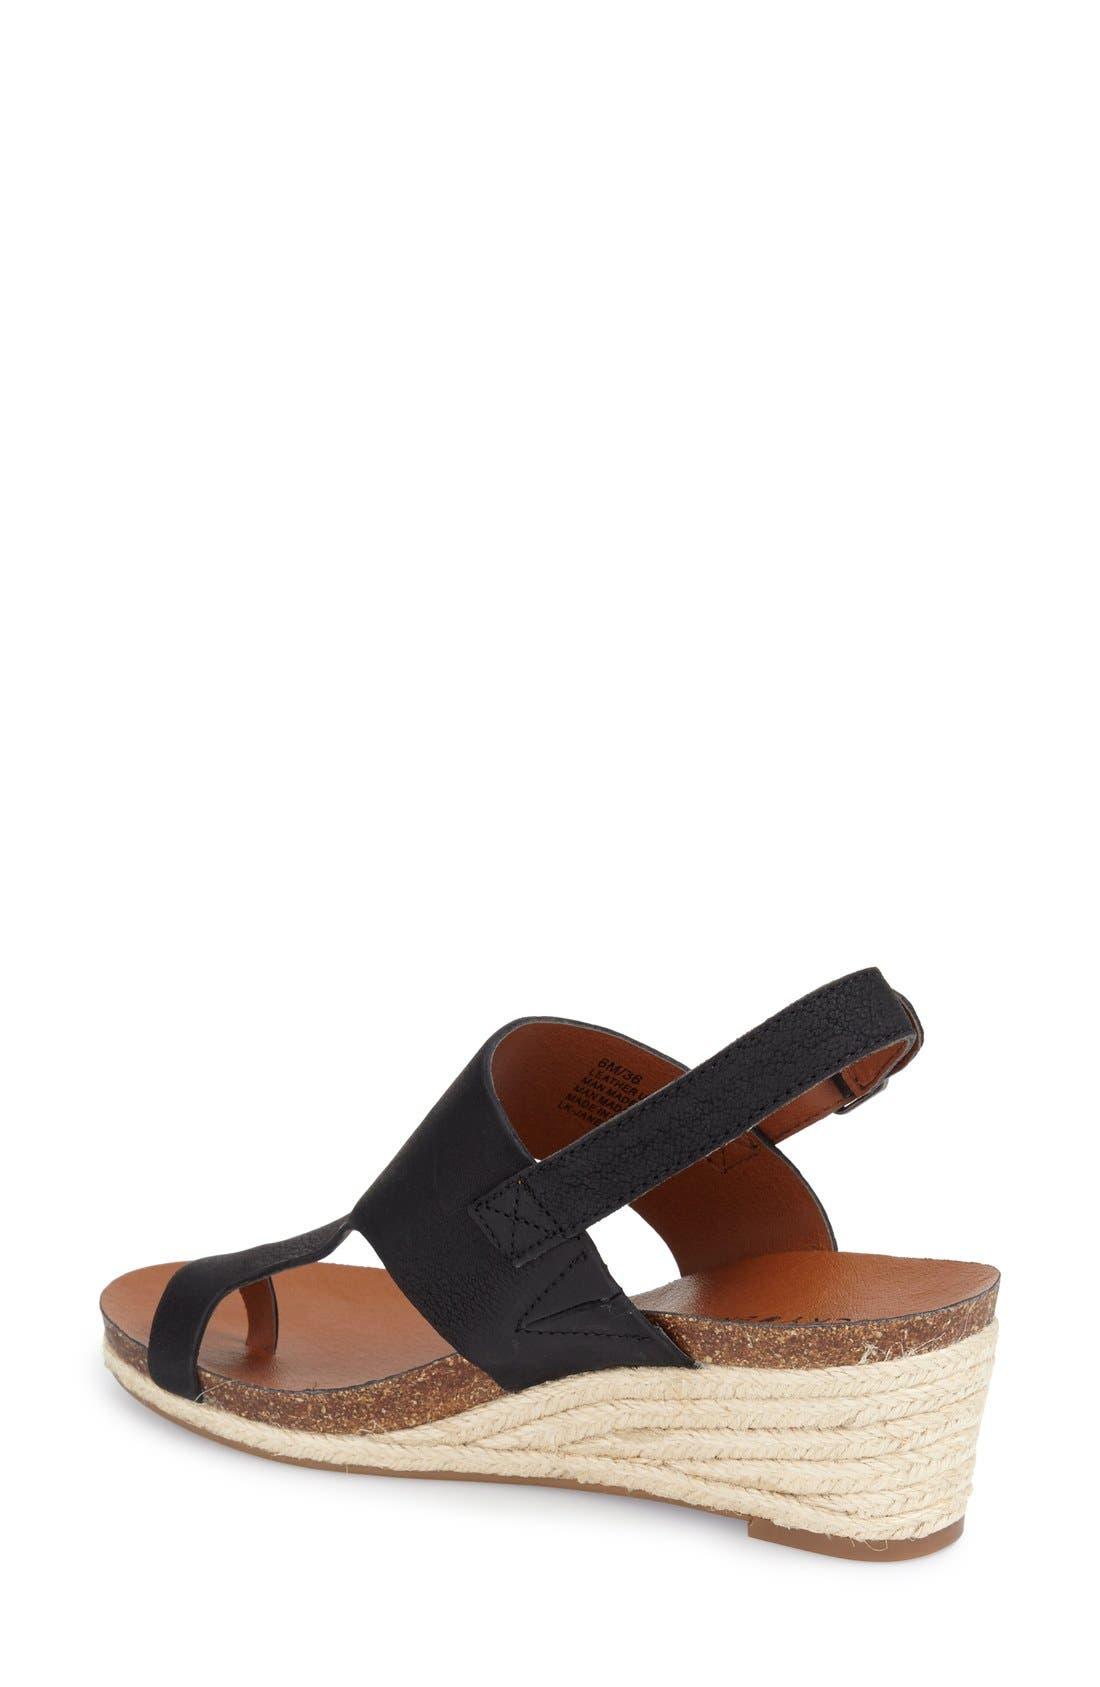 Alternate Image 2  - Lucky Brand 'Janessa' Espadrille Wedge Sandal (Women)